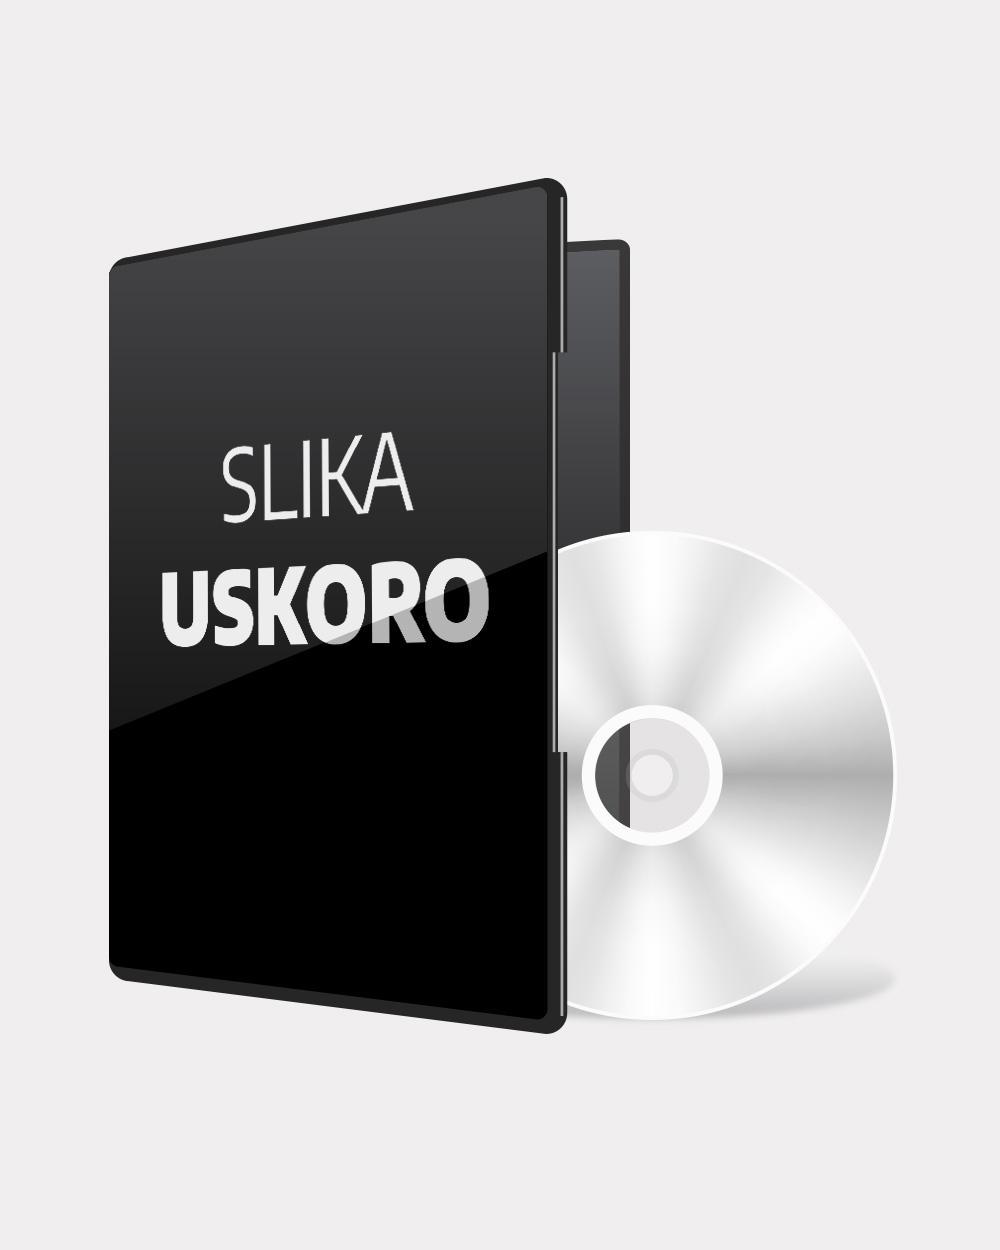 Konzola Nintendo SWITCH + Mario Kart 8 Deluxe Edition igrica